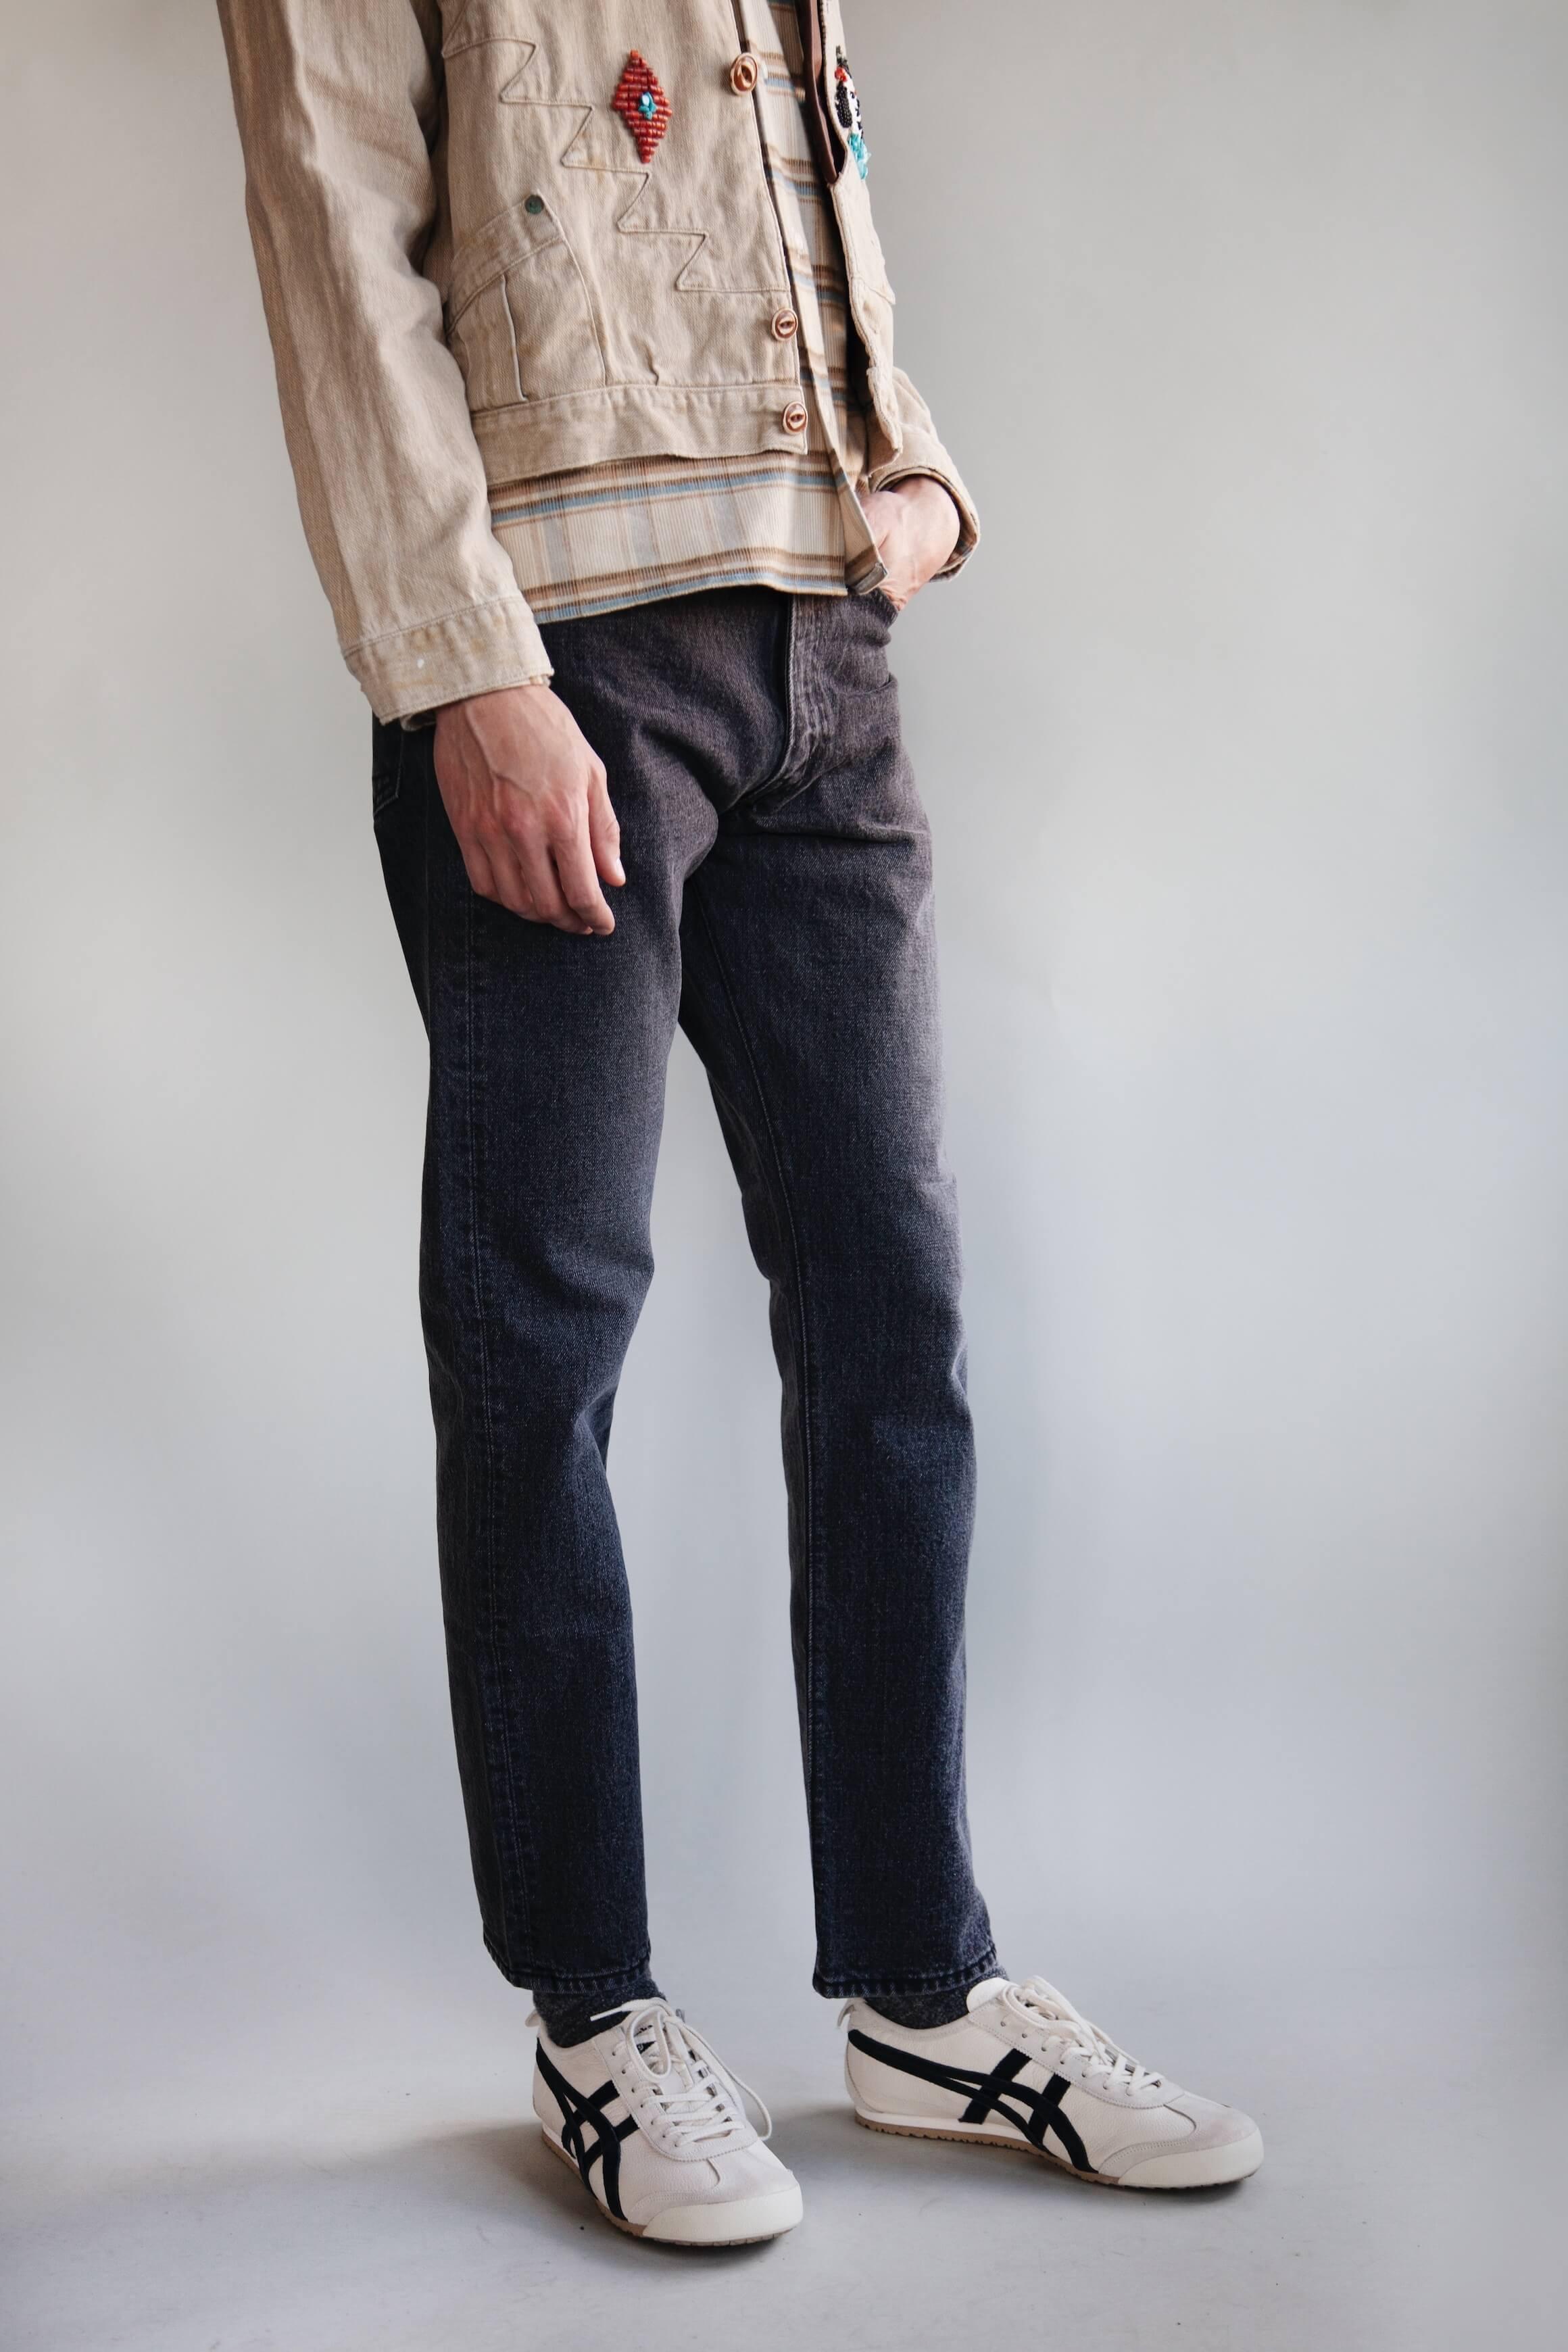 kapital kountry thunderbird jacket, gitman bros. vintage camp collar shirt, orslow 107 ivy denim and onitsuka tiger mexico 66 shoes on body